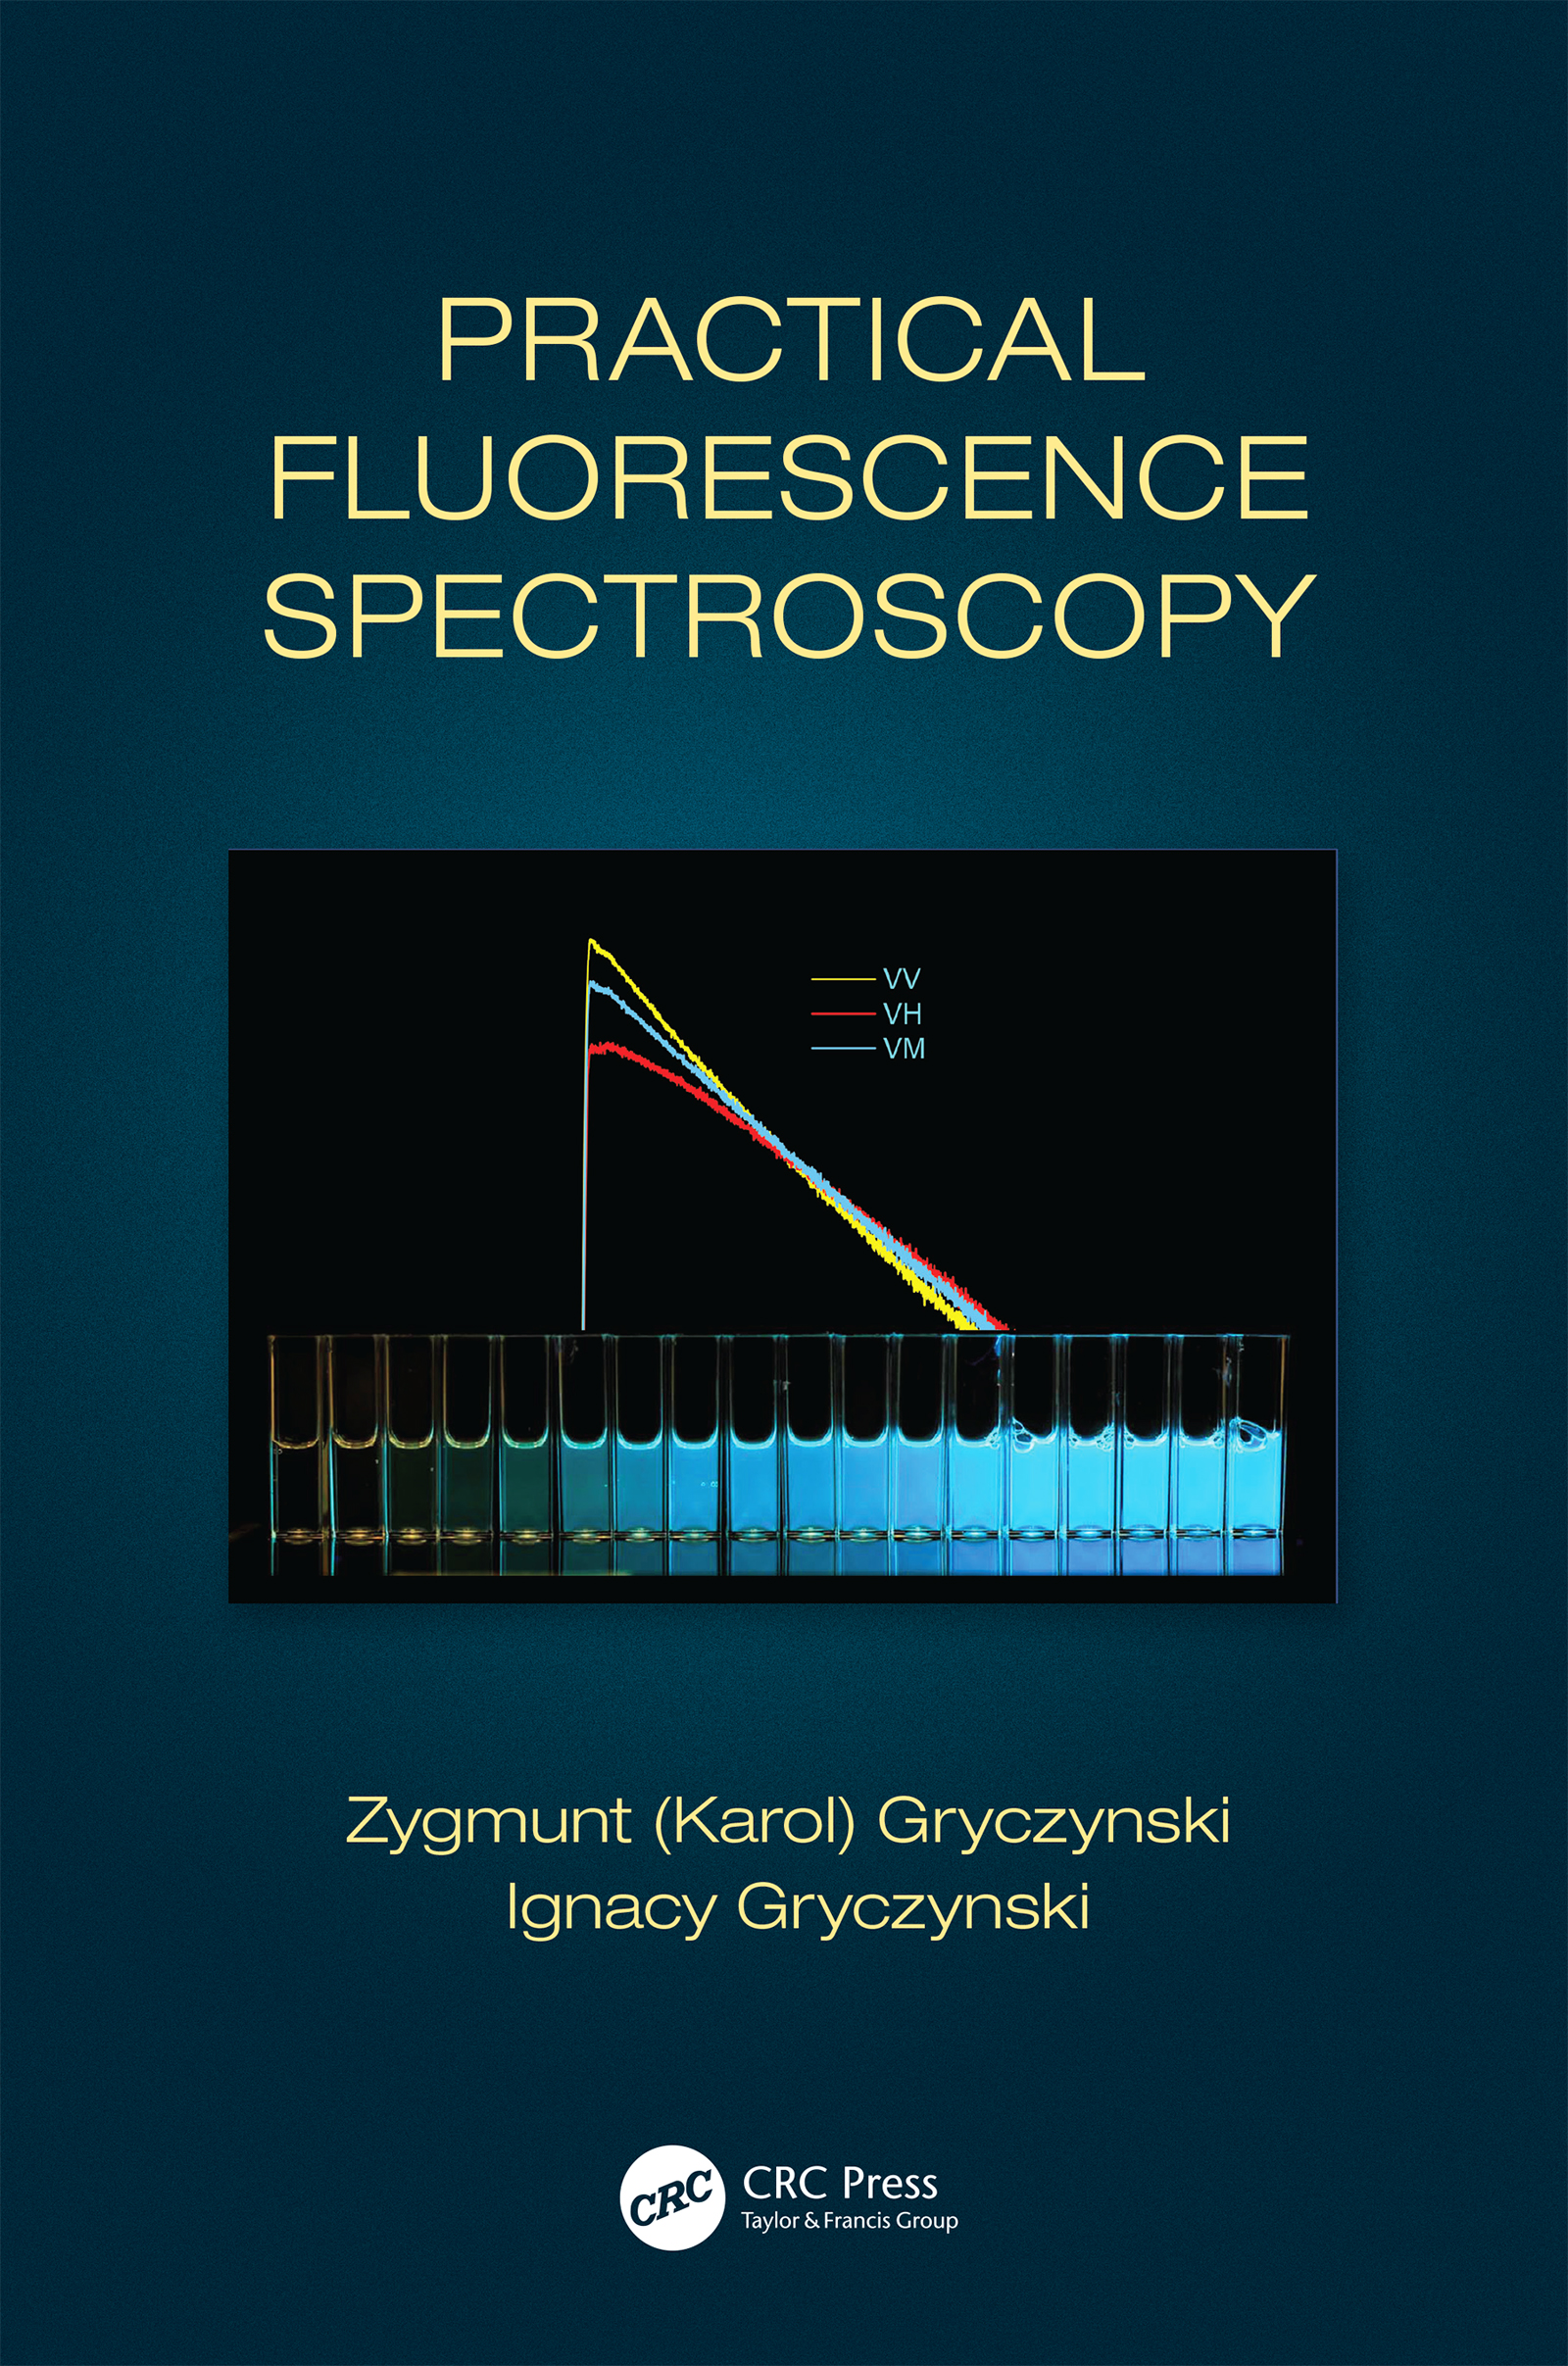 Practical Fluorescence Spectroscopy book cover